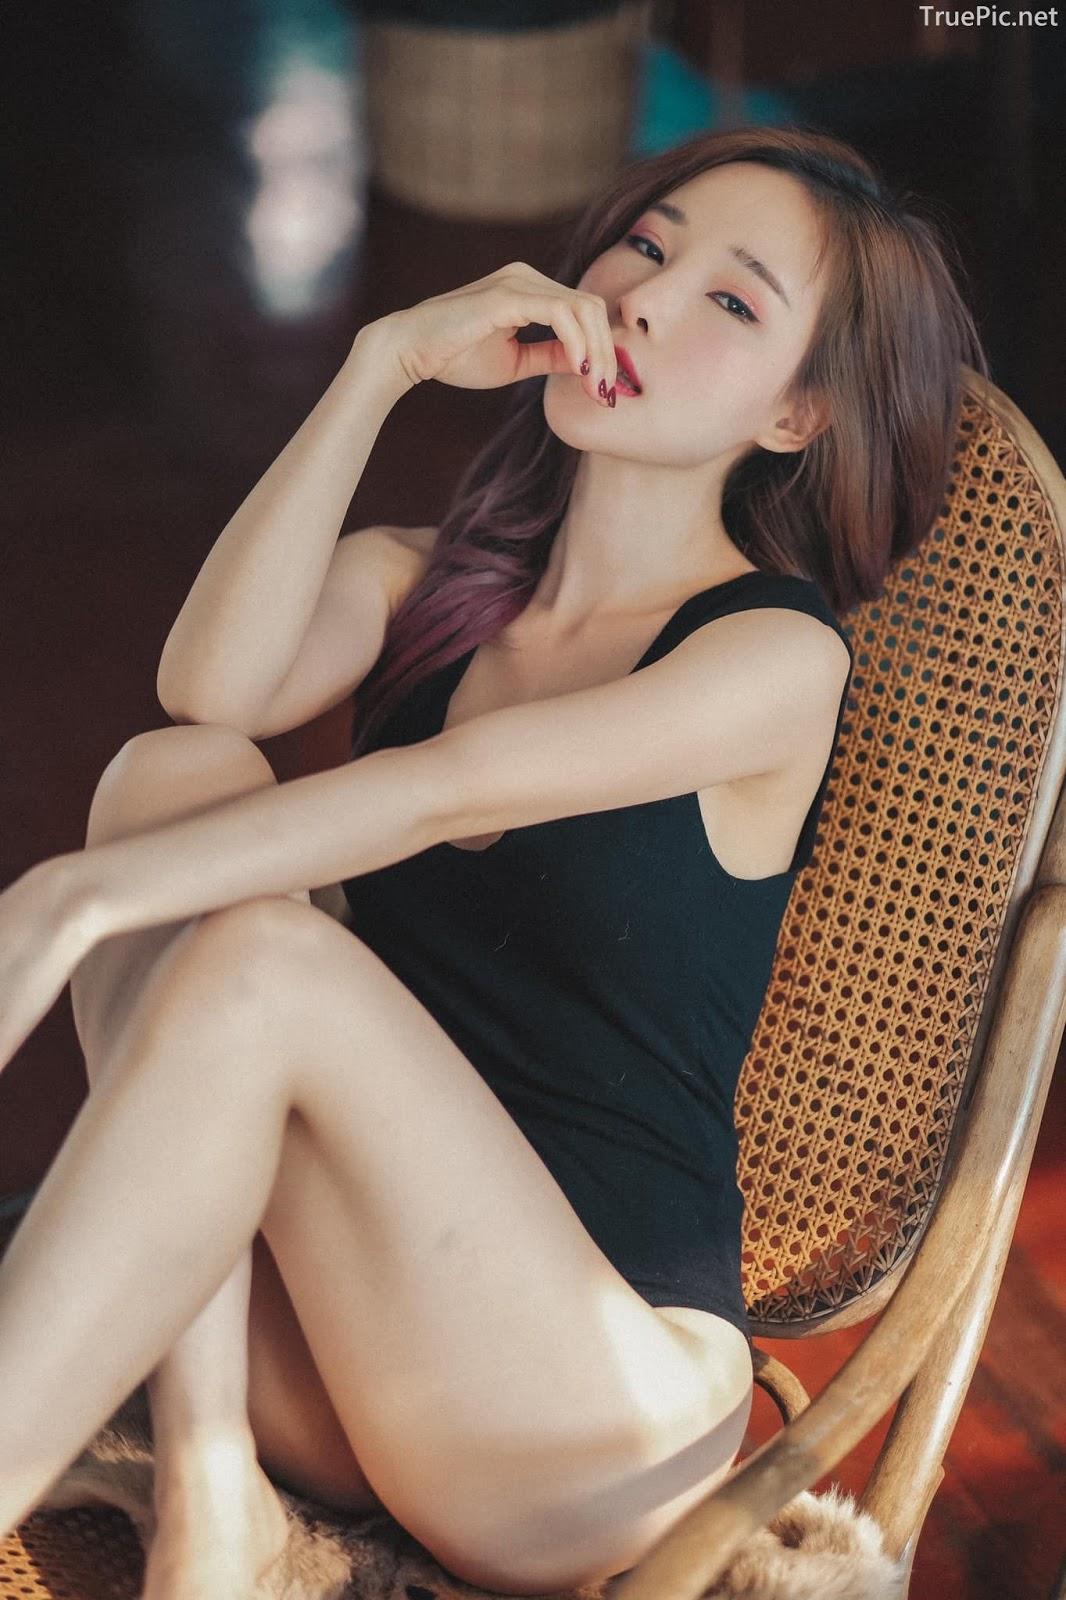 Thailand model - Arys Nam-in (Arysiacara) - Black Rose feeling the sun - Picture 8